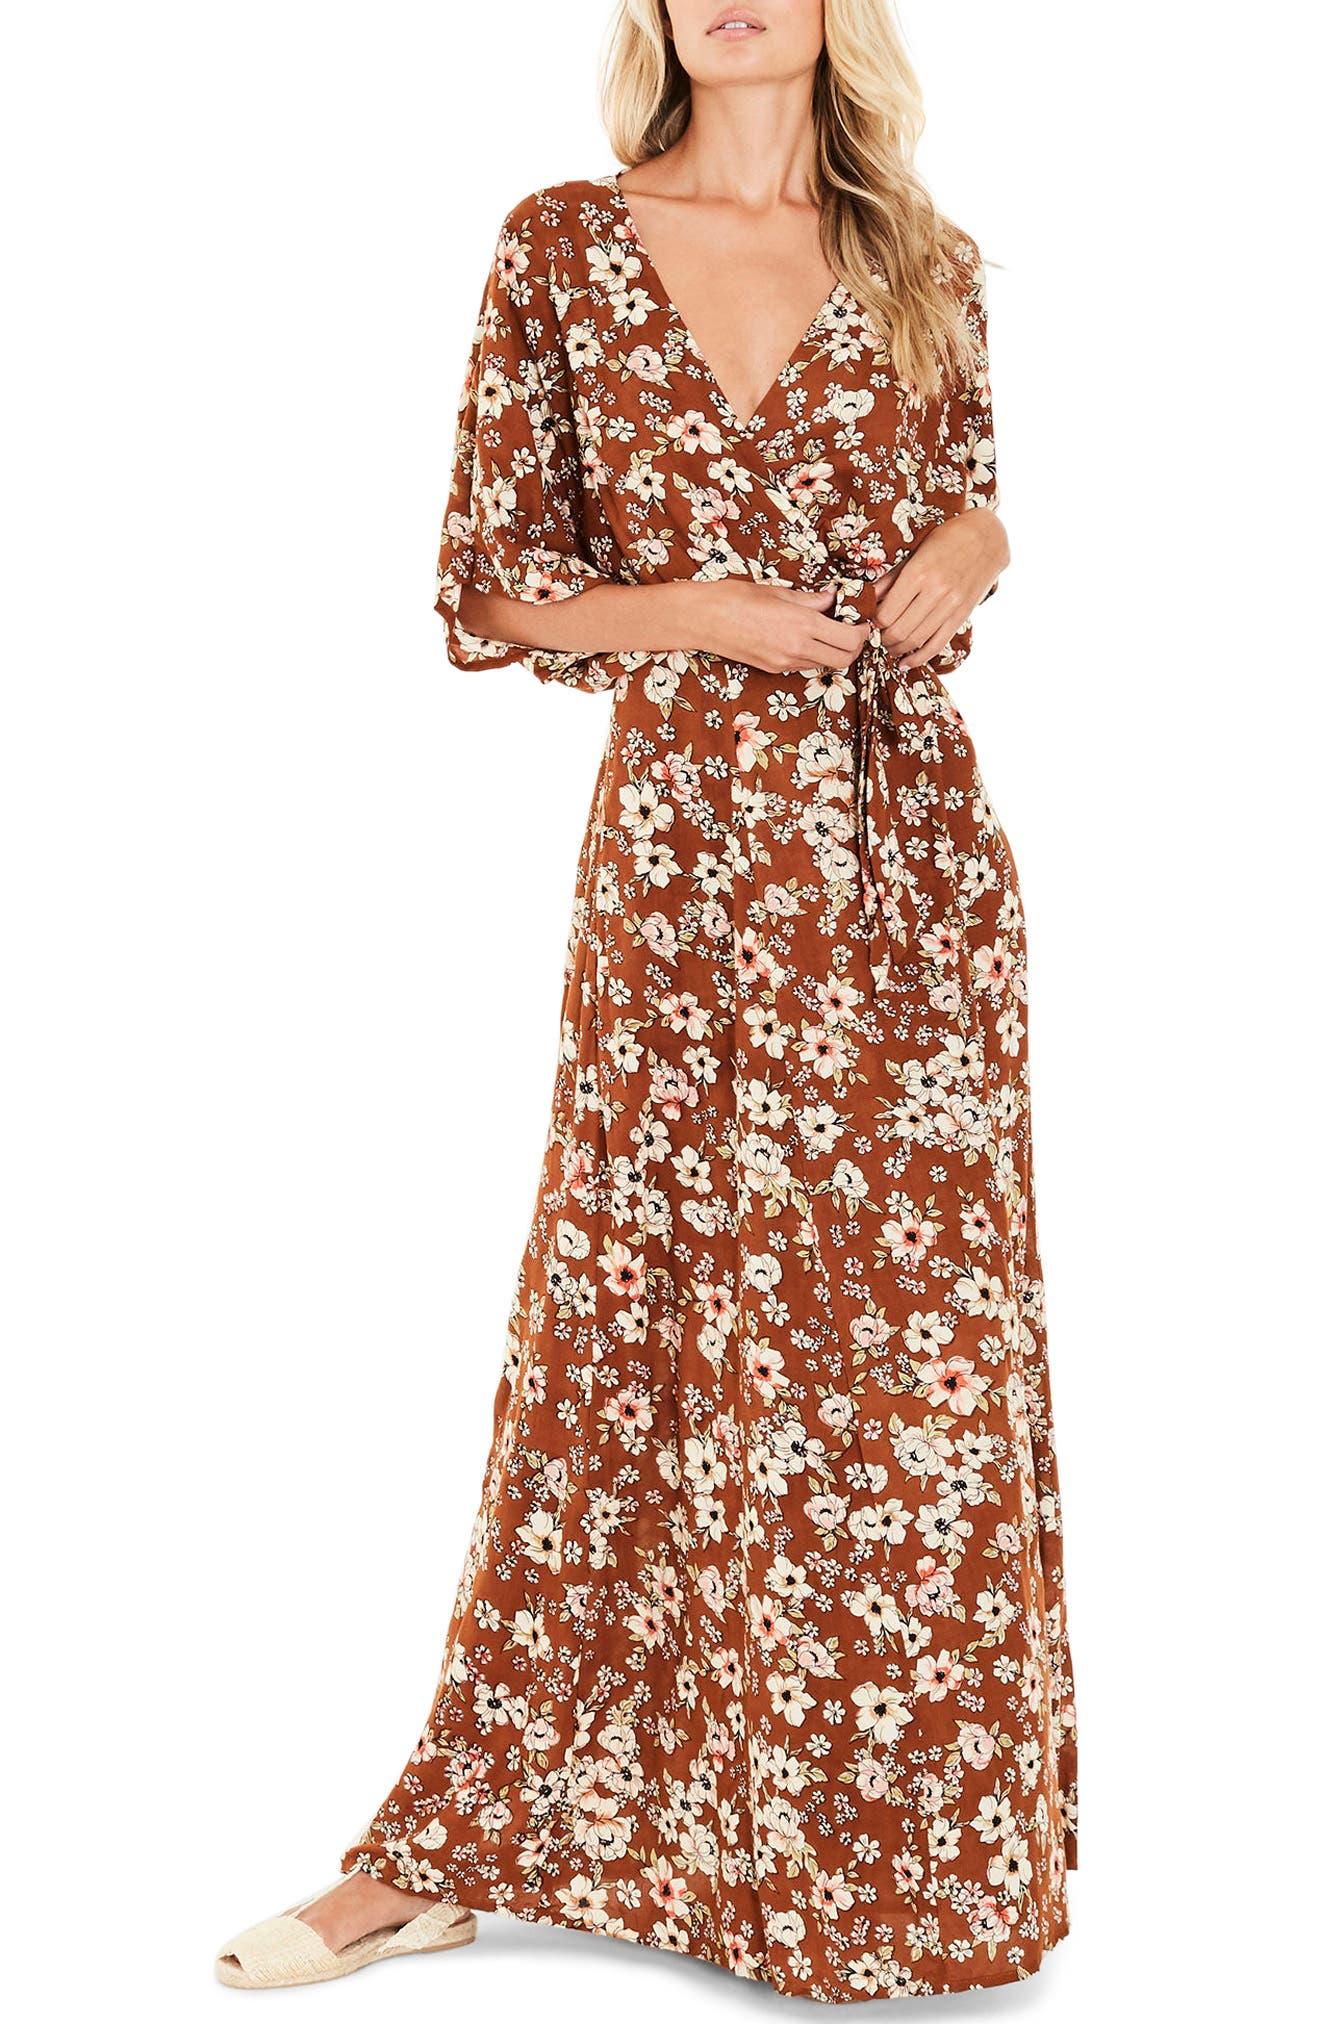 Bergamo Maxi Wrap Dress,                         Main,                         color, 650